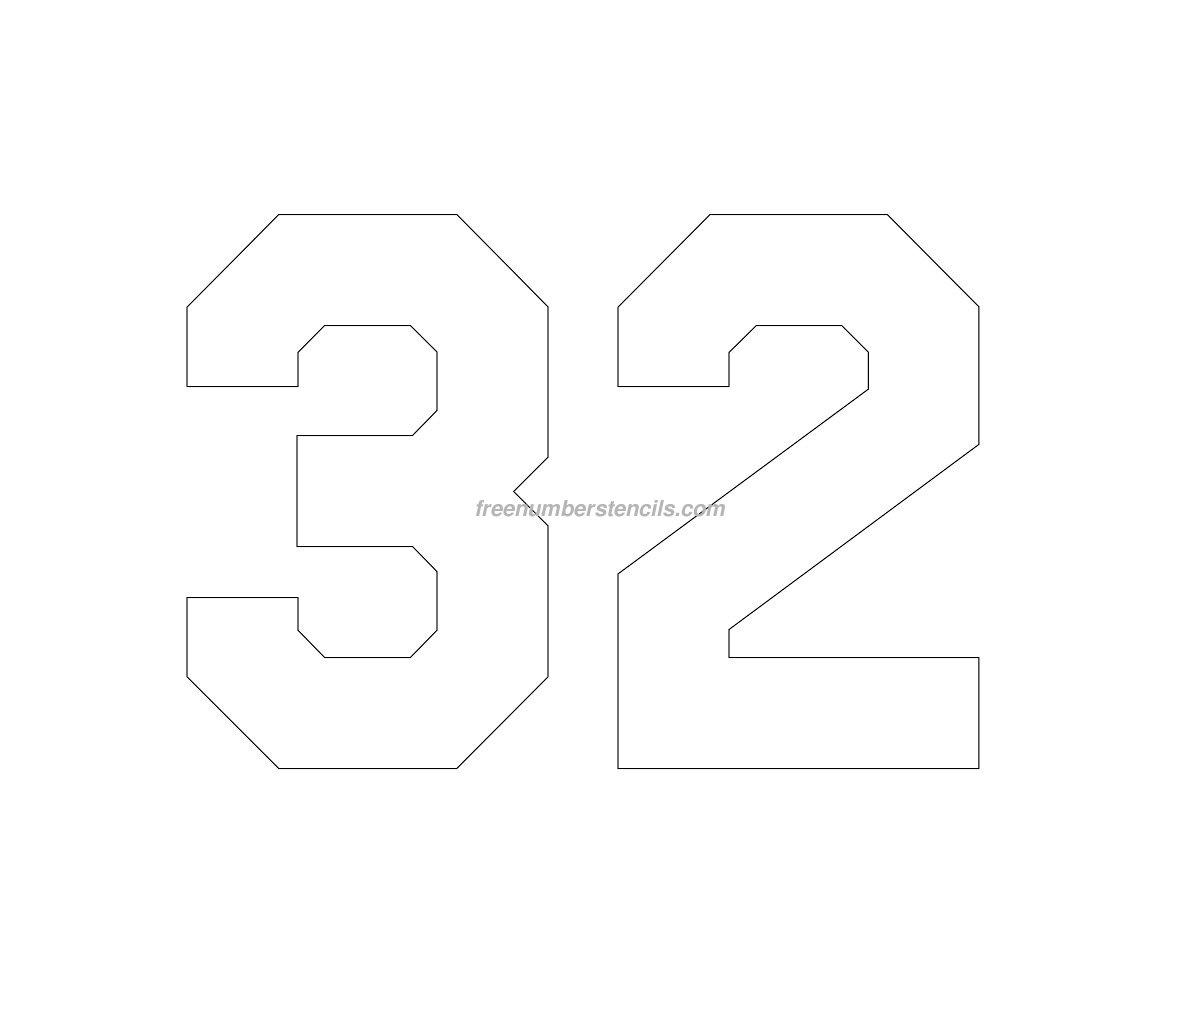 11 Free Printable Number Stencils Designs Images - Free Printable - Free Printable Number Stencils